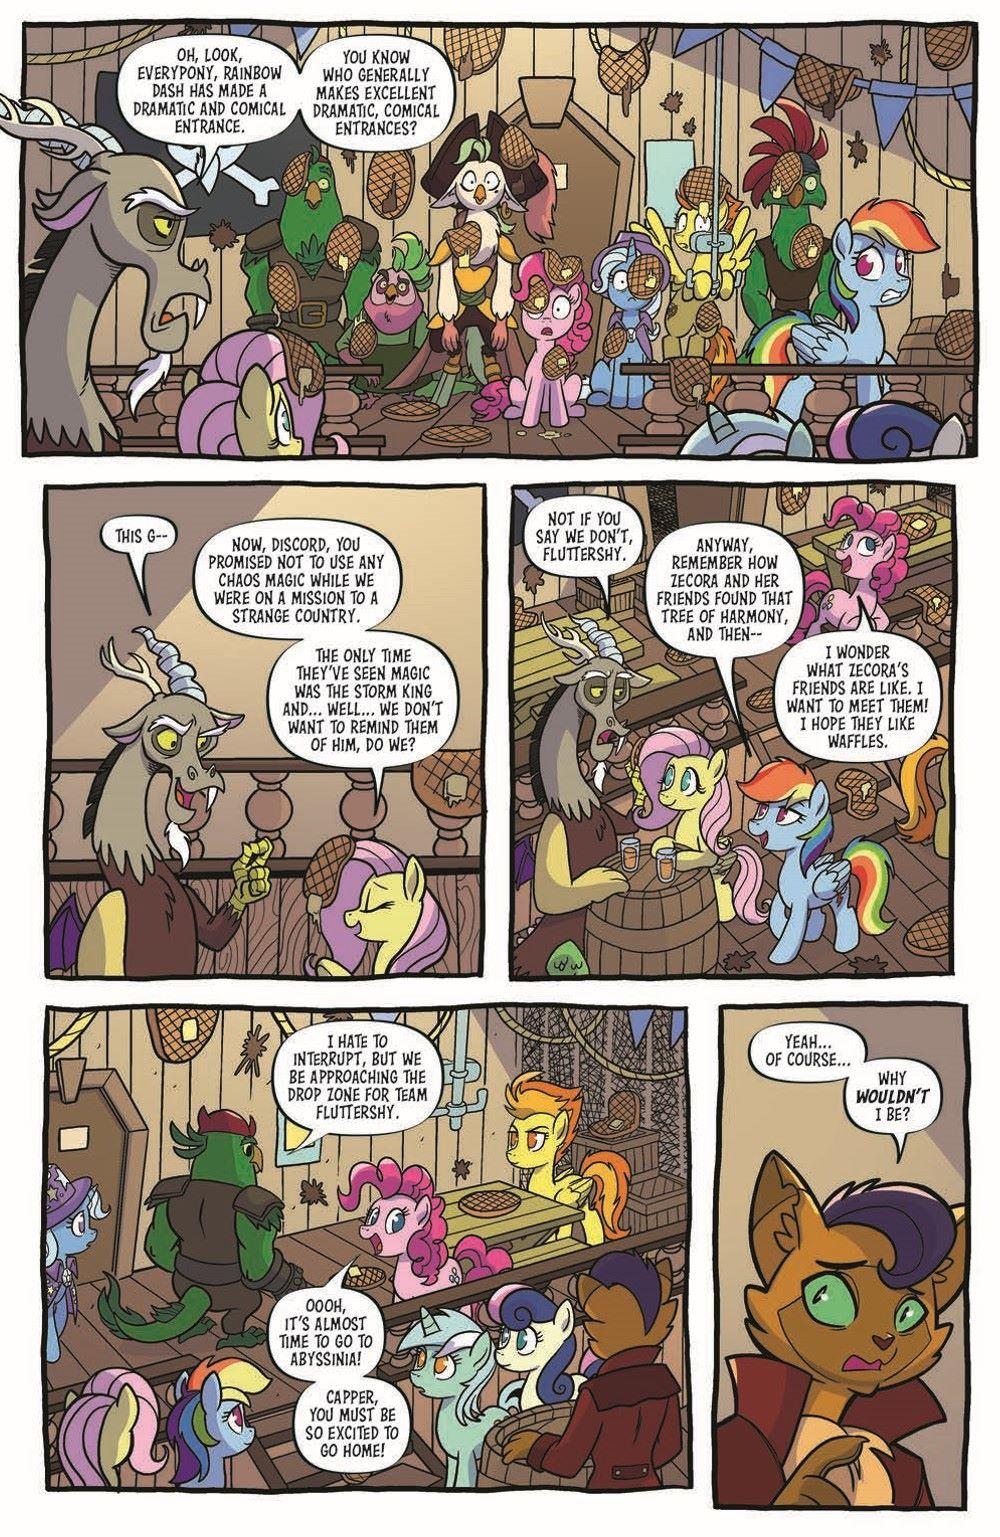 MLP96-pr-4 ComicList Previews: MY LITTLE PONY FRIENDSHIP IS MAGIC #96